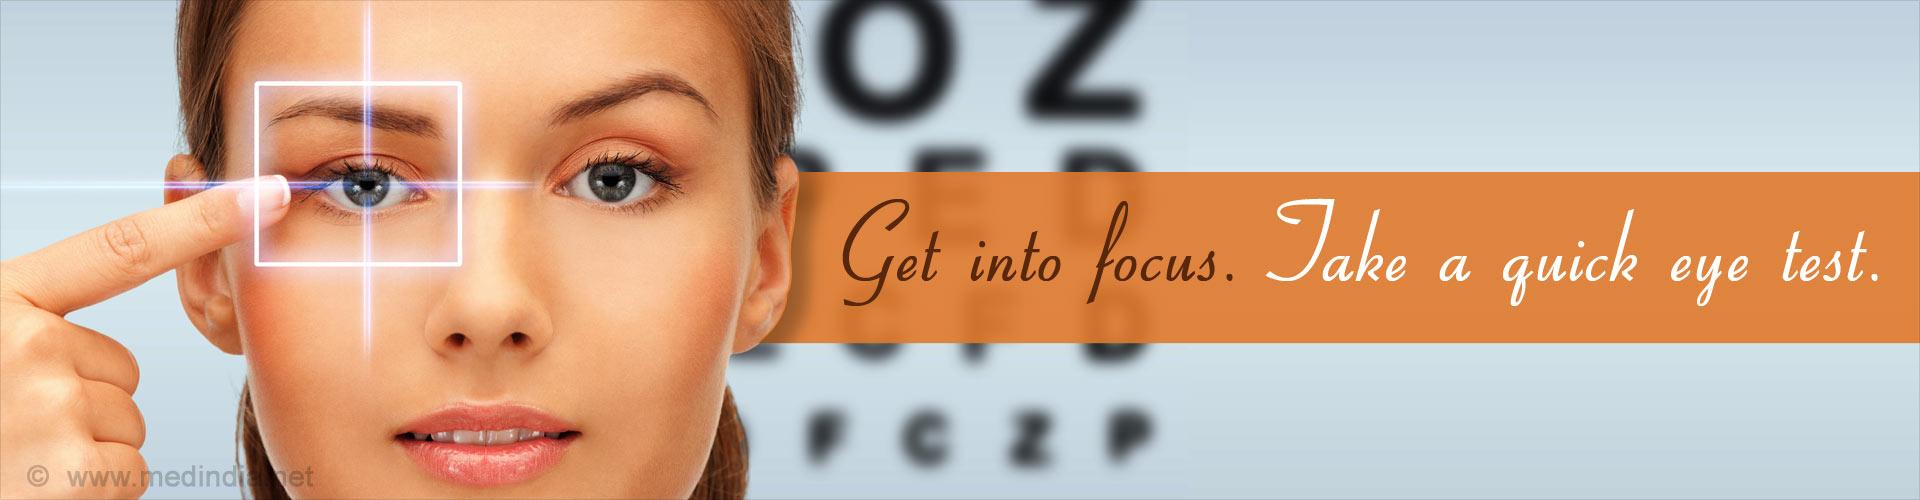 Eye Test for Myopia or Near-sightedness